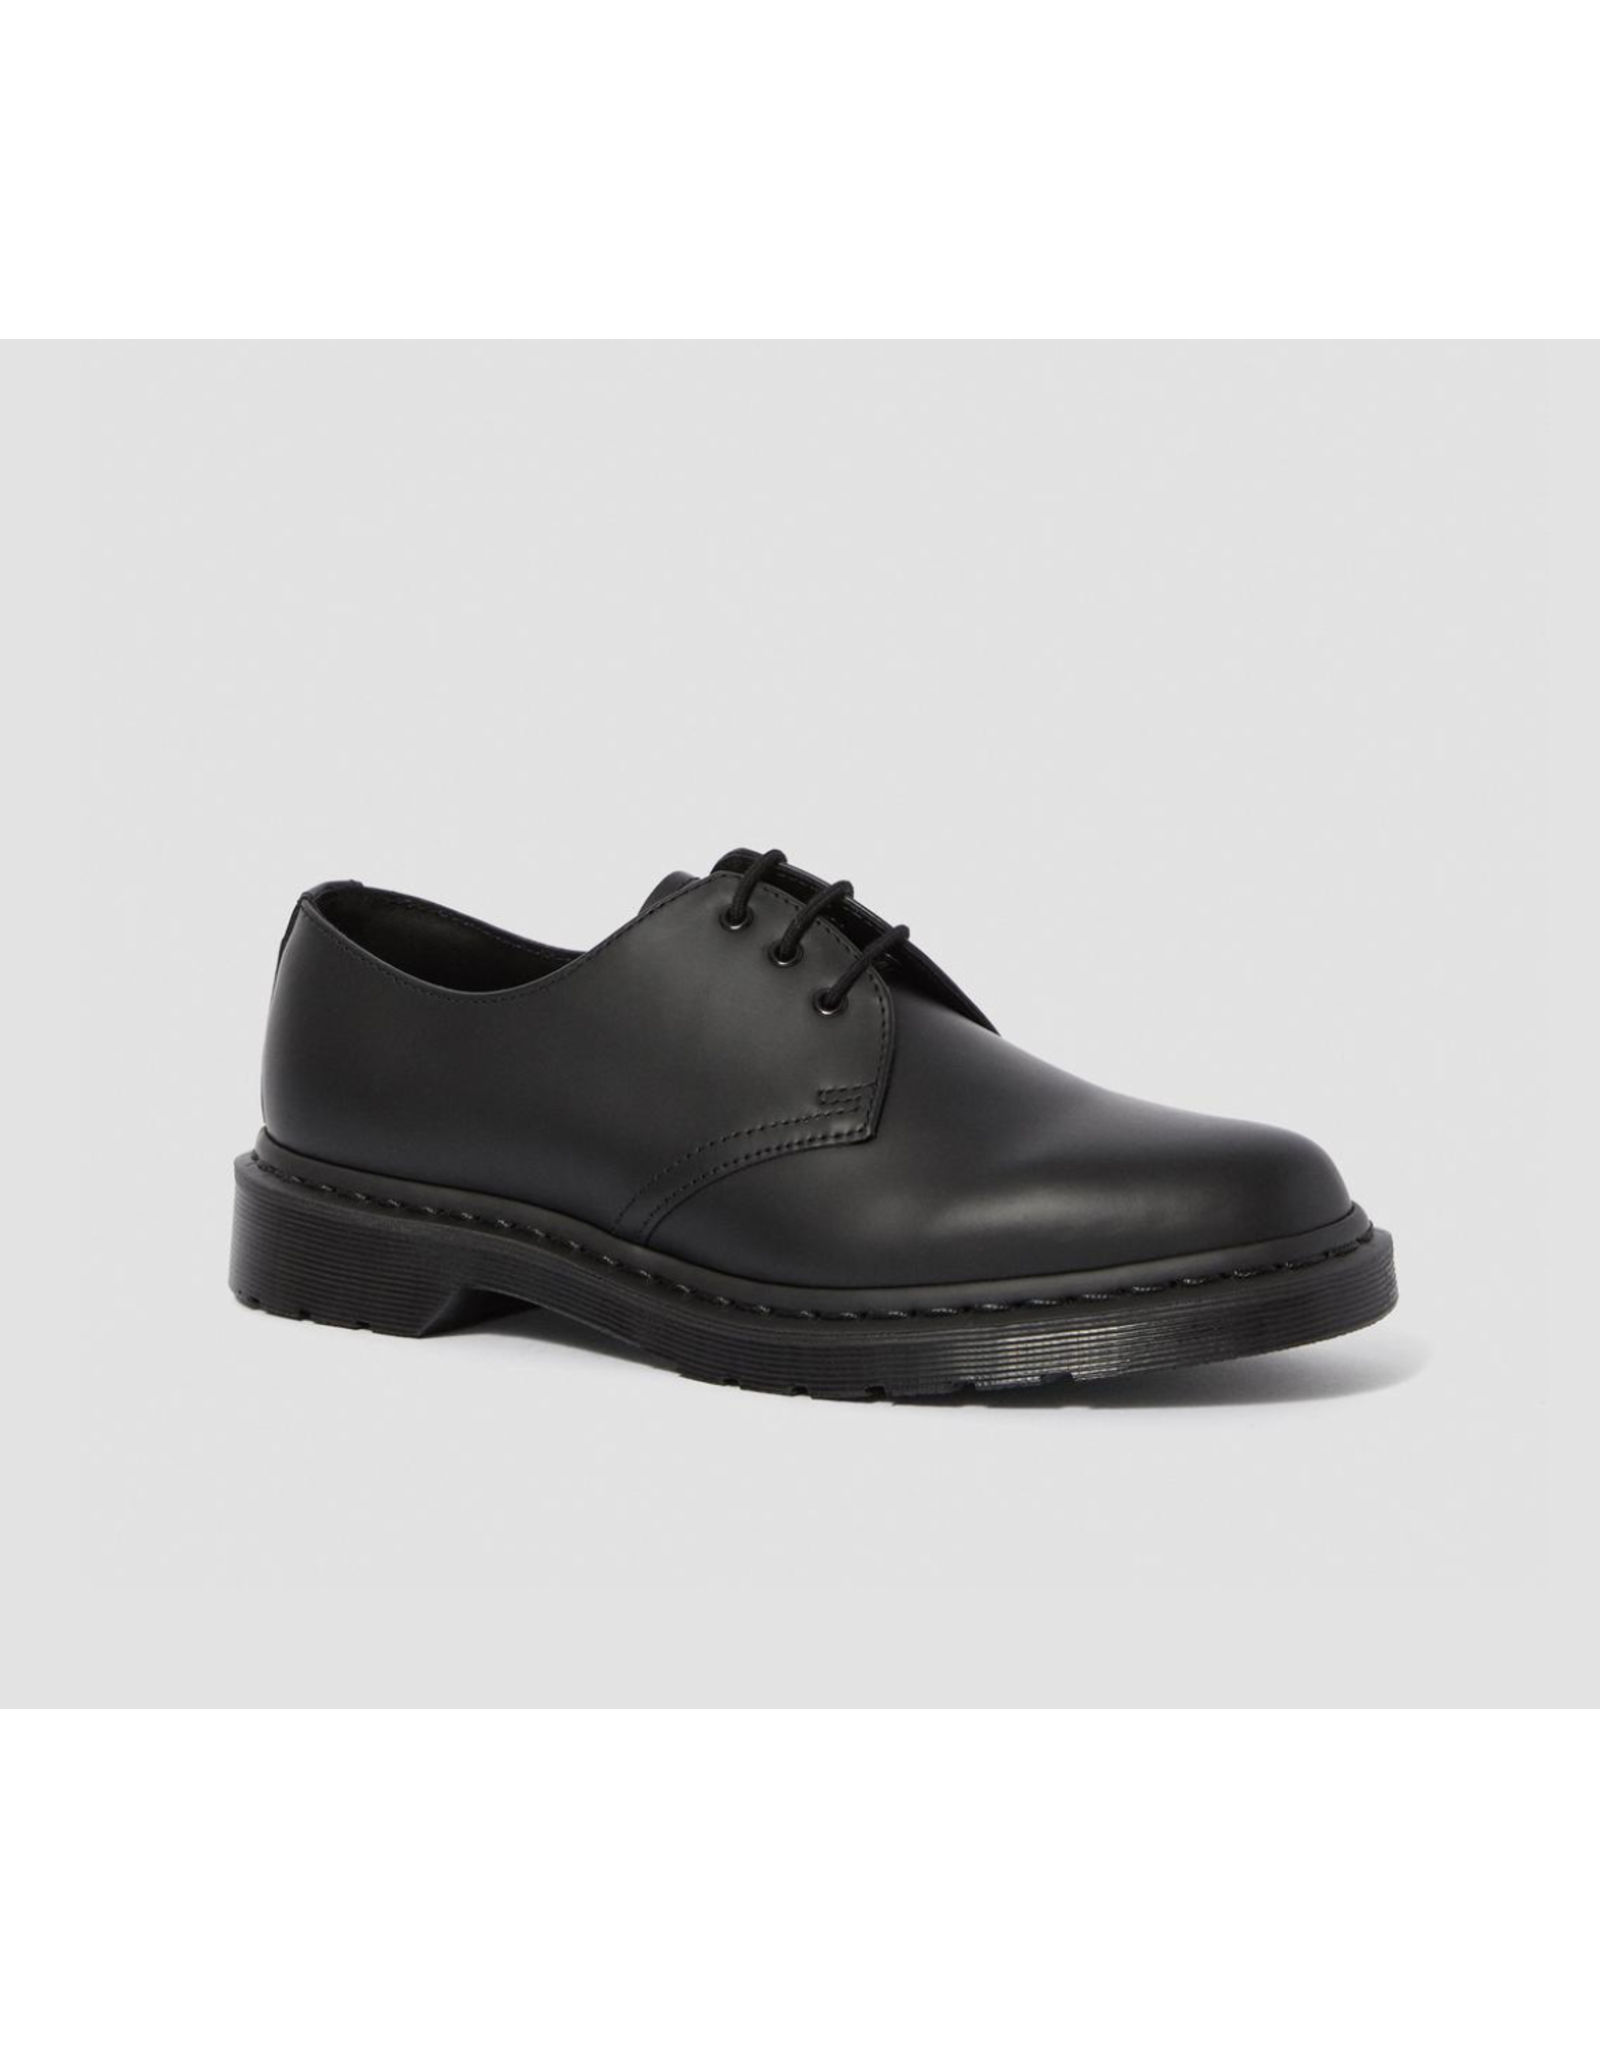 DR. MARTENS Dr Martens 1461 mono black